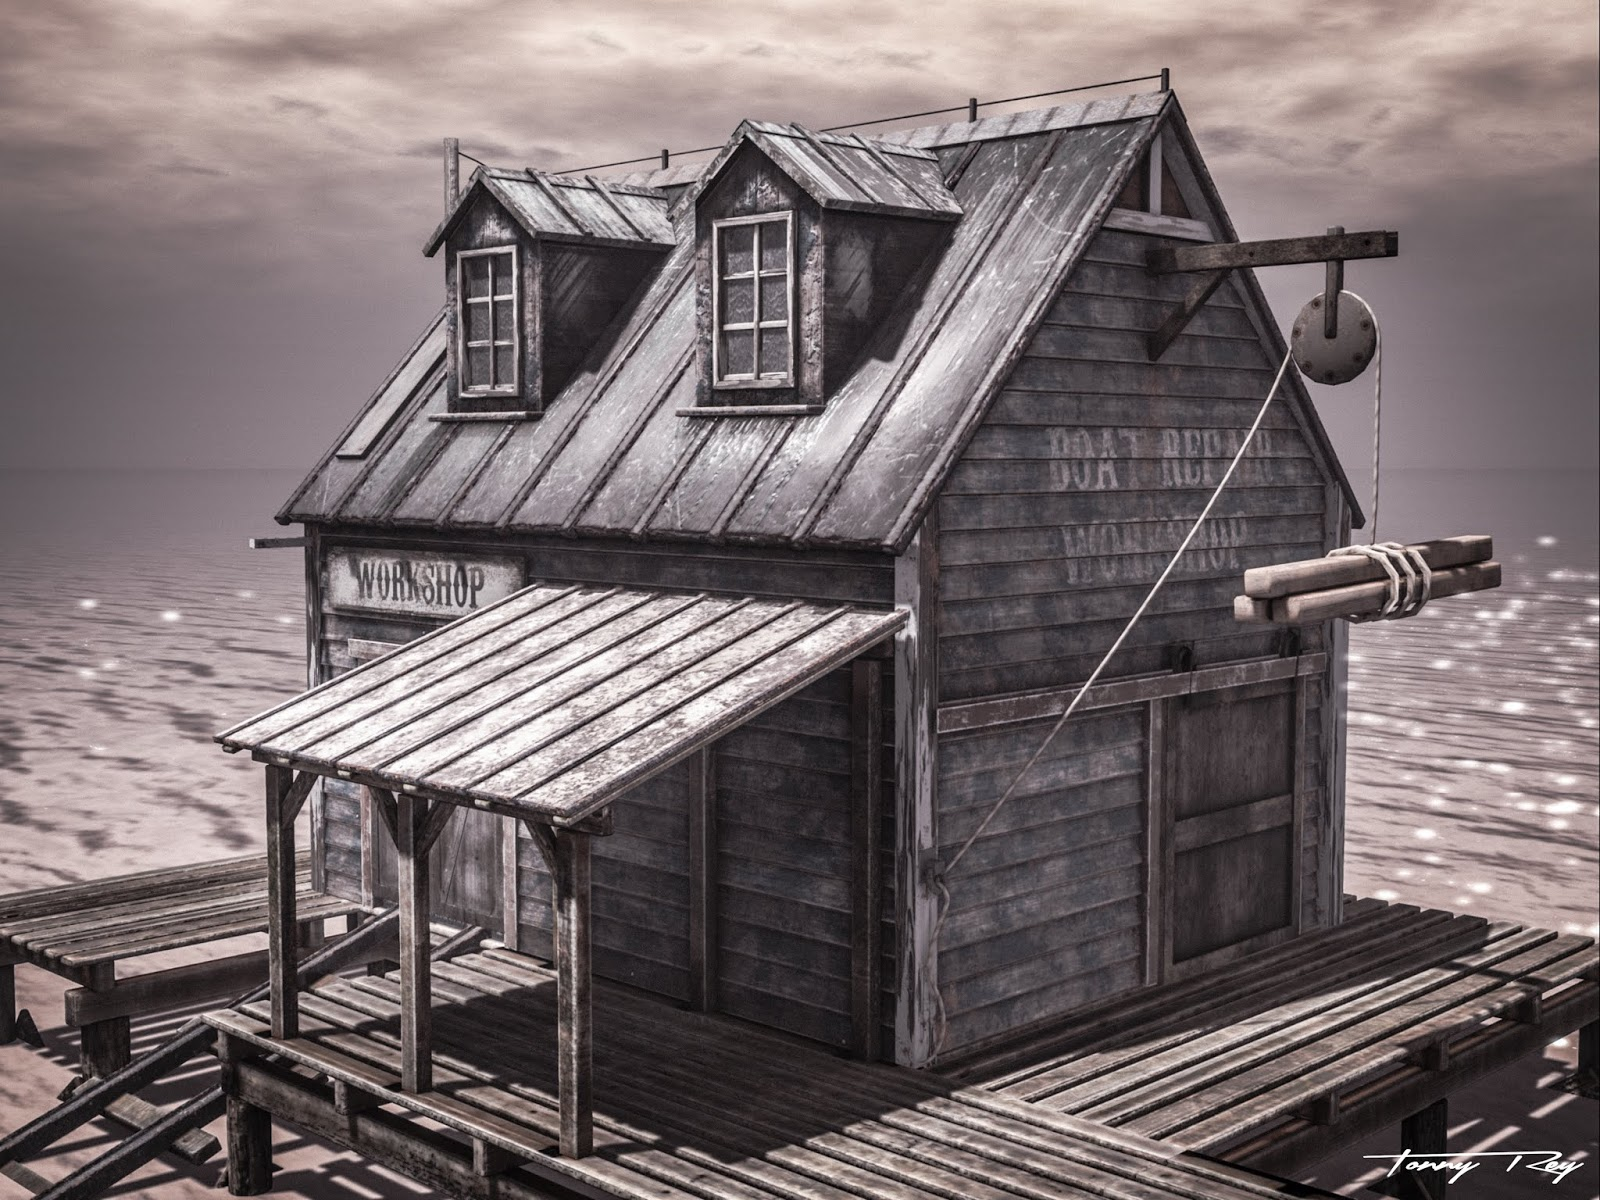 NTD - The Old Boat Workshop